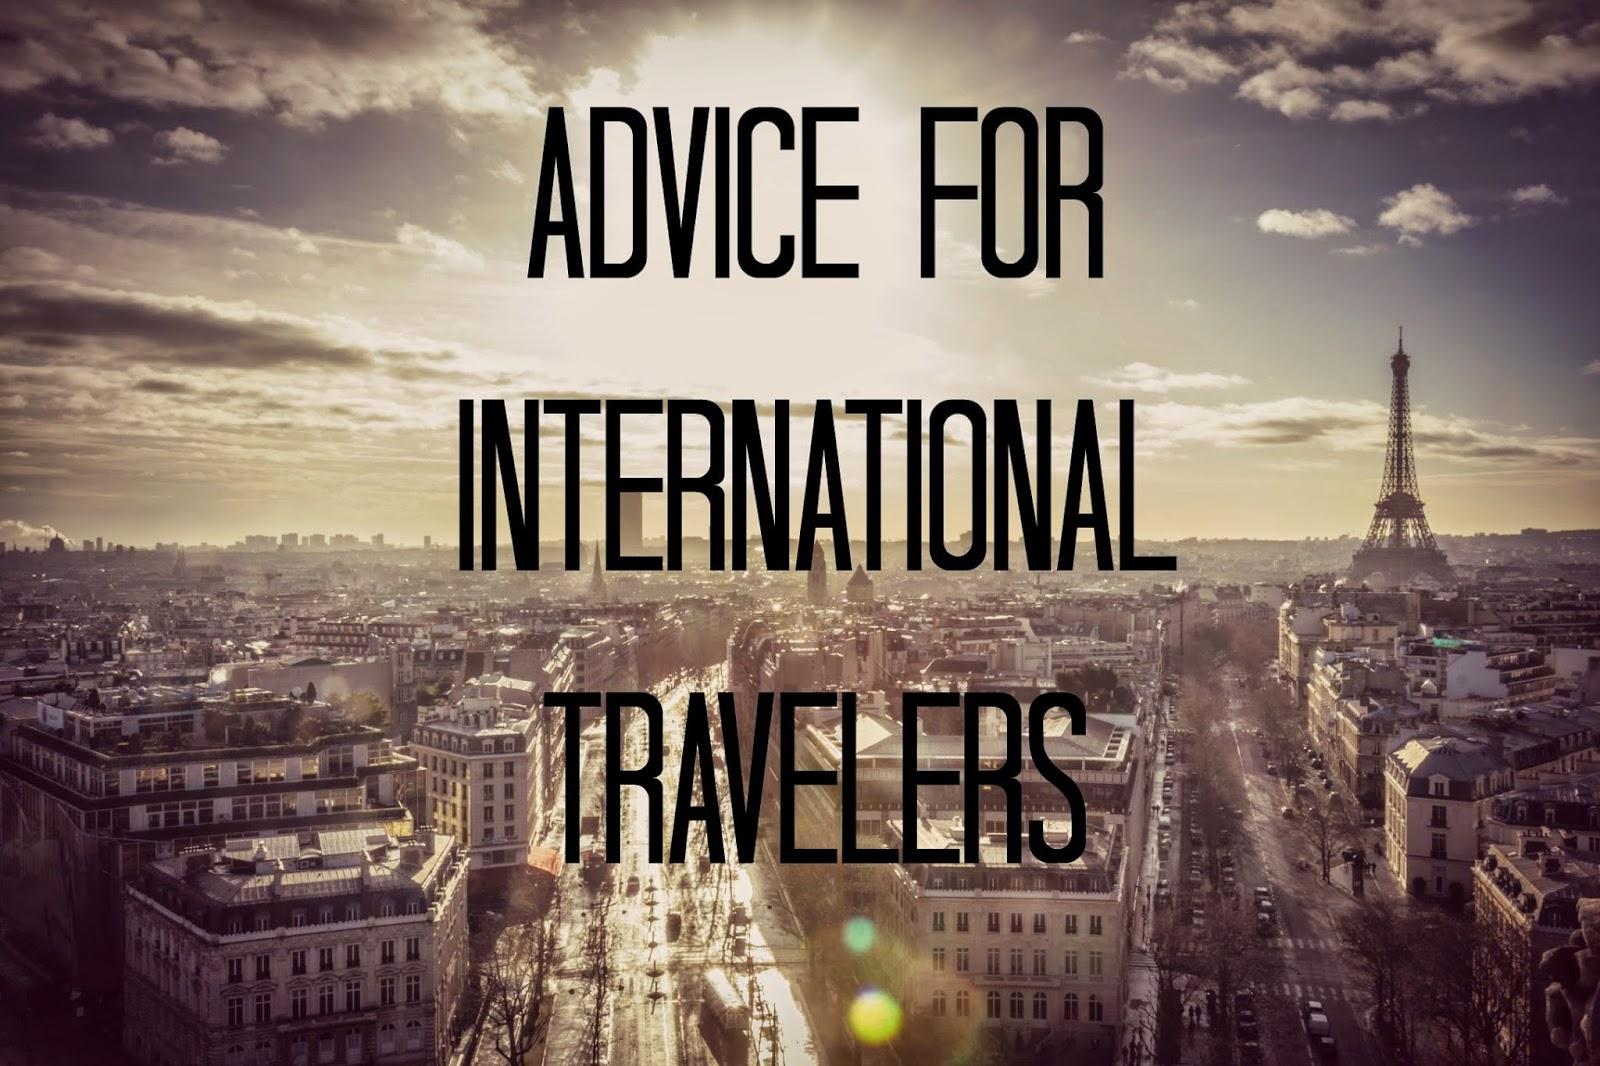 Advice for International Travelers